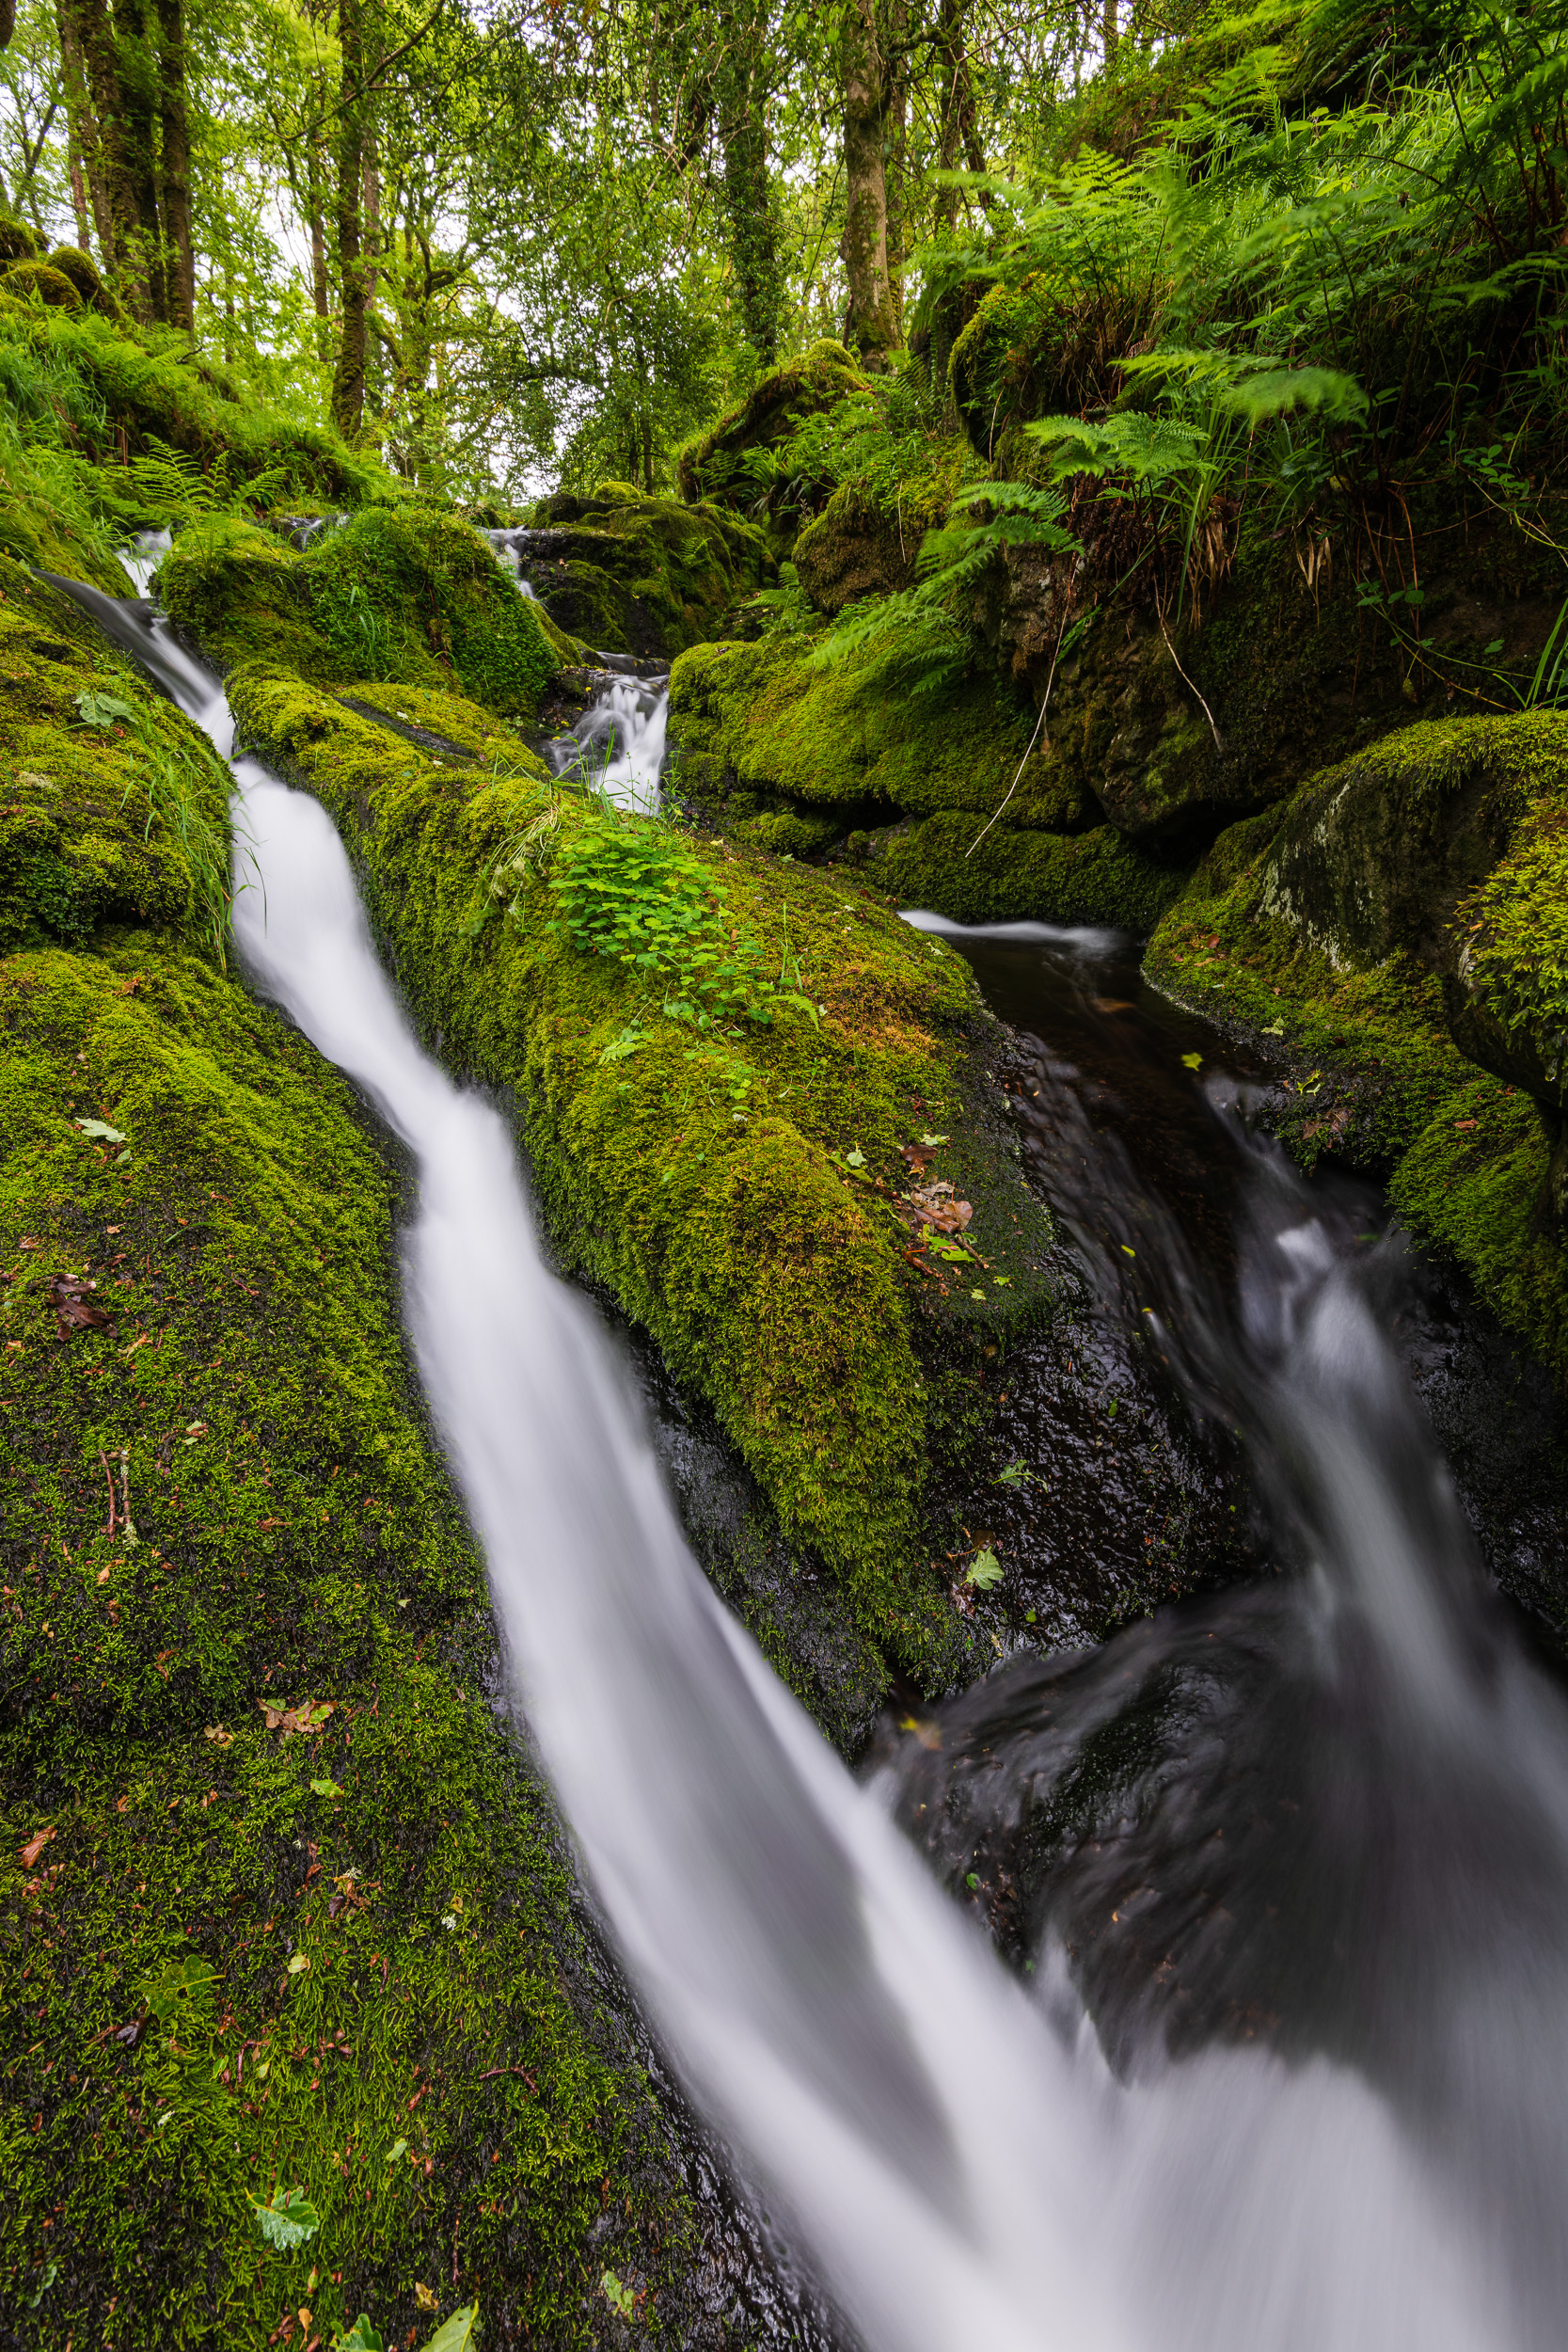 The Flow, Dartmoor, Devon  - Nikon D850, Nikkor 16-35 mm f/4 at 16 mm, f/11, 2.5 sec at ISO 64, Kase CPL.